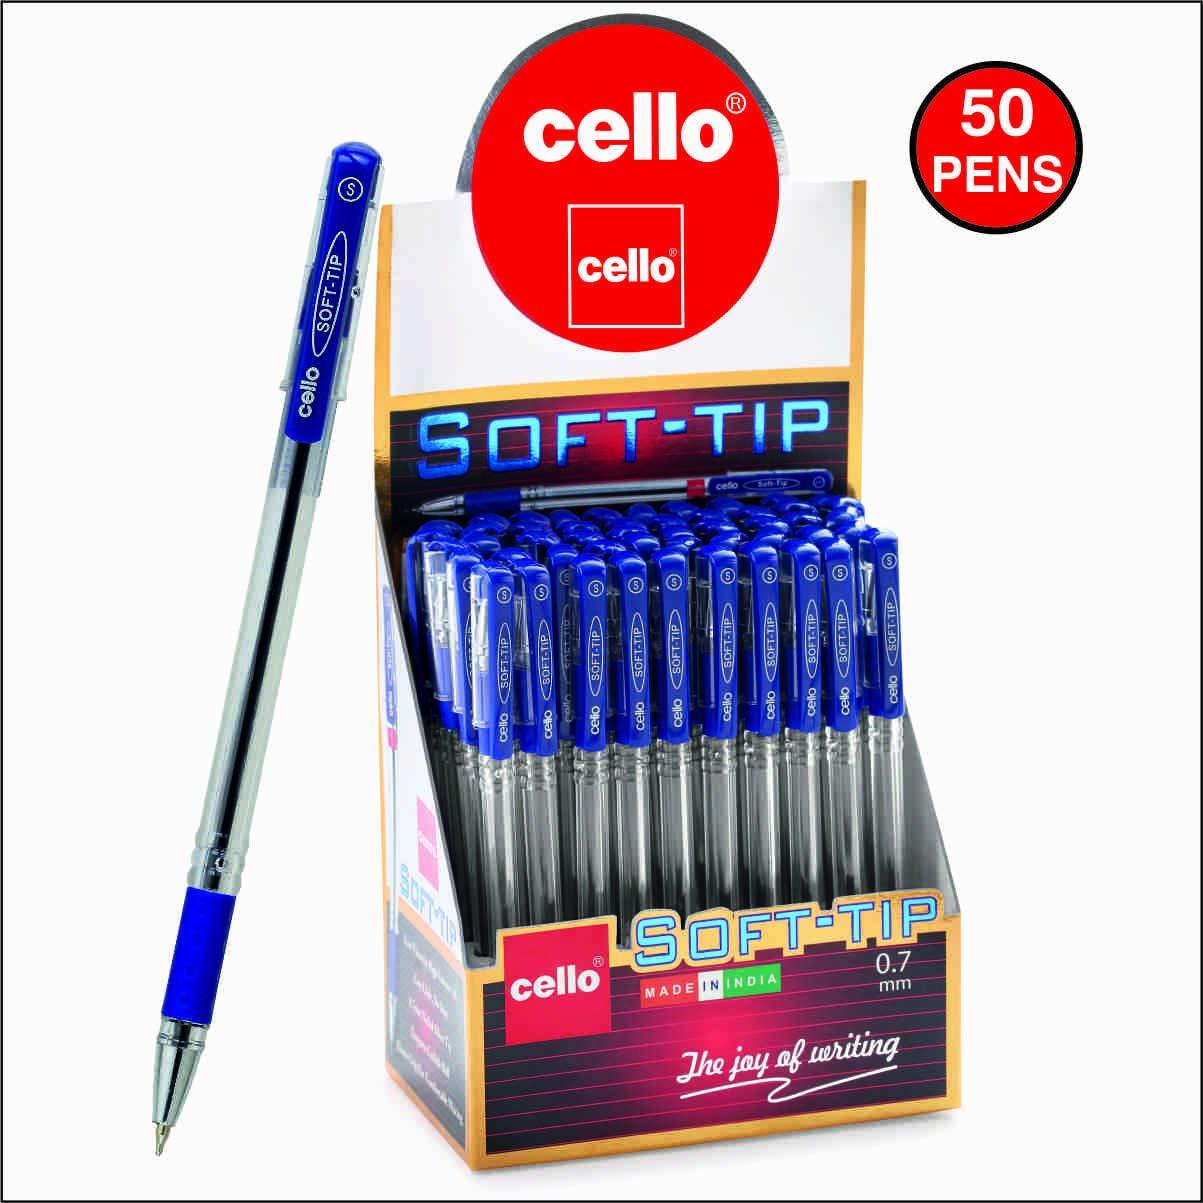 Cello Pens Export Pack 50 Soft-Tip Ballpen (Blue ink)